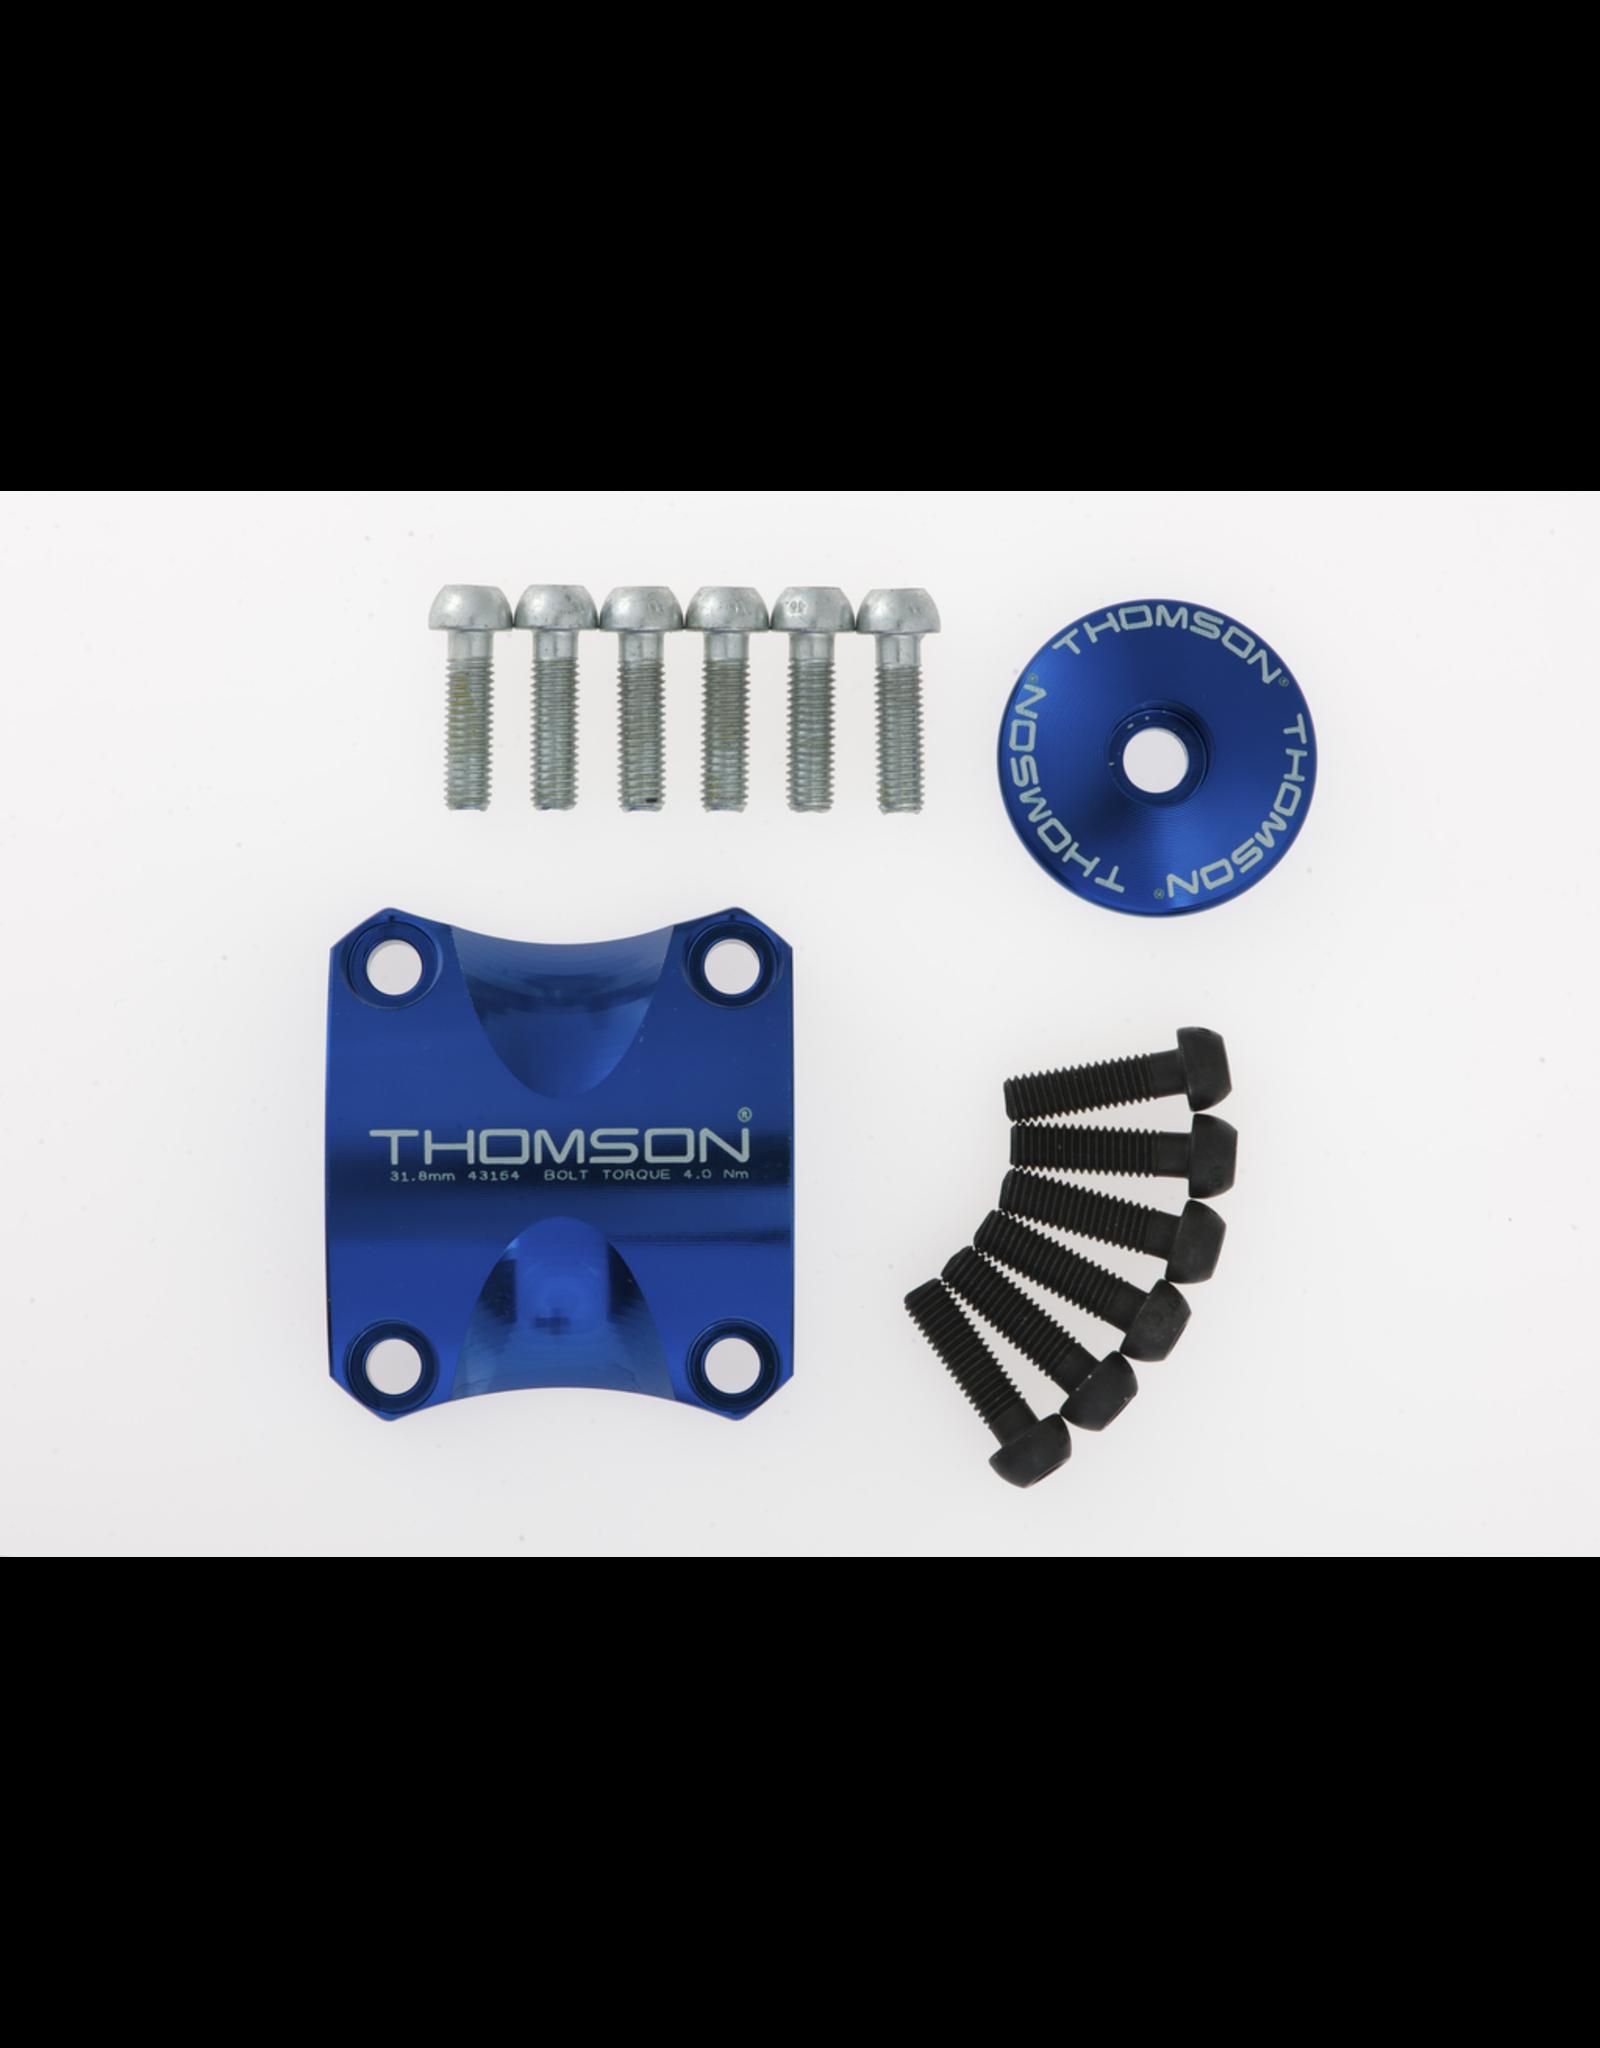 Thomson STEM THOMSON ELITE X4 BLUE DRESS UP KIT